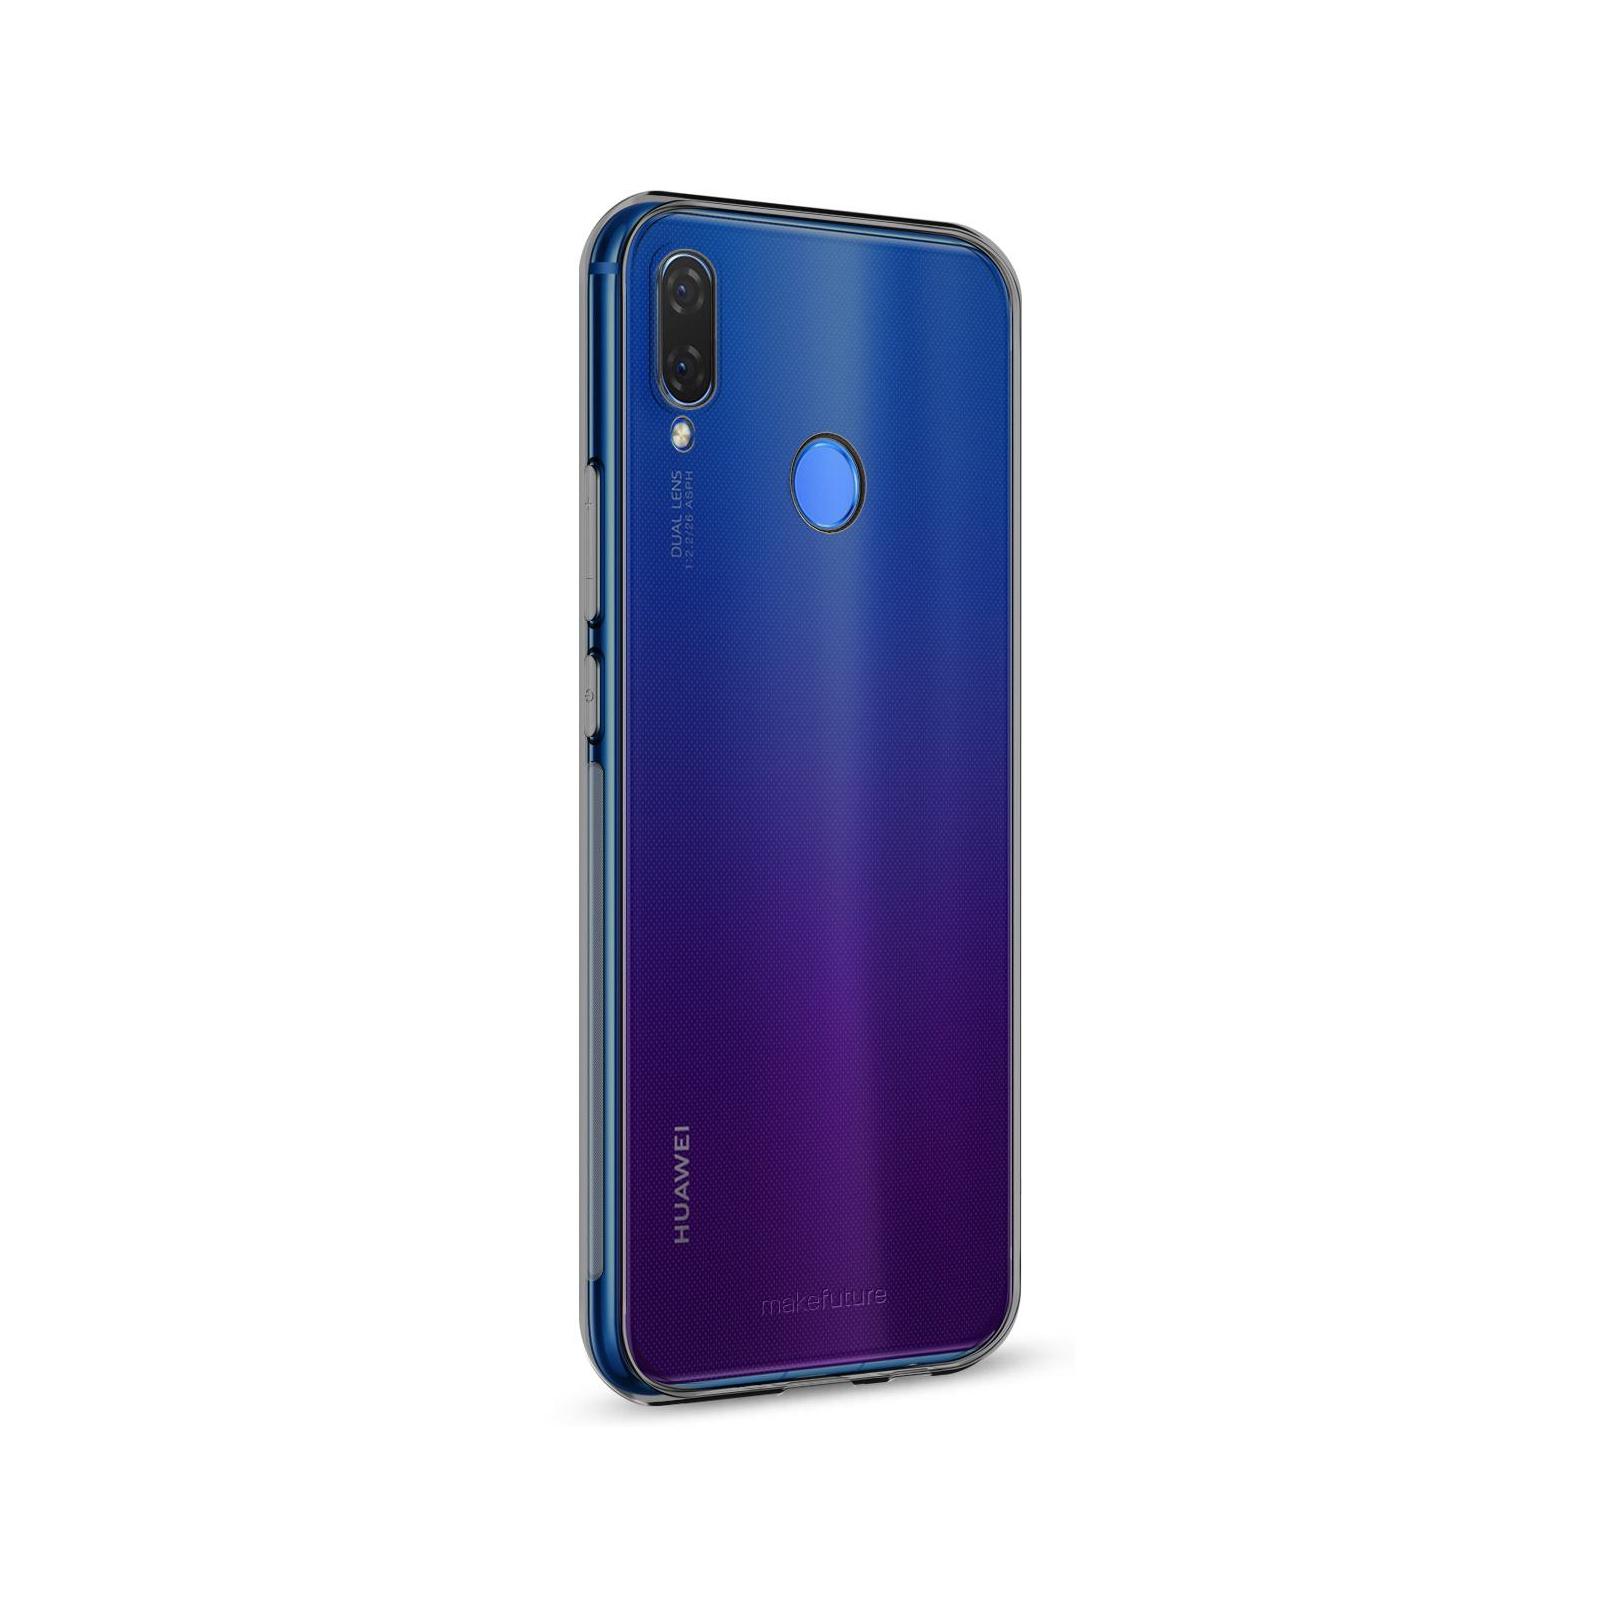 Чехол для моб. телефона MakeFuture Air Case (TPU) Huawei P Smart Plus Black (MCA-HUPSPBK) изображение 2